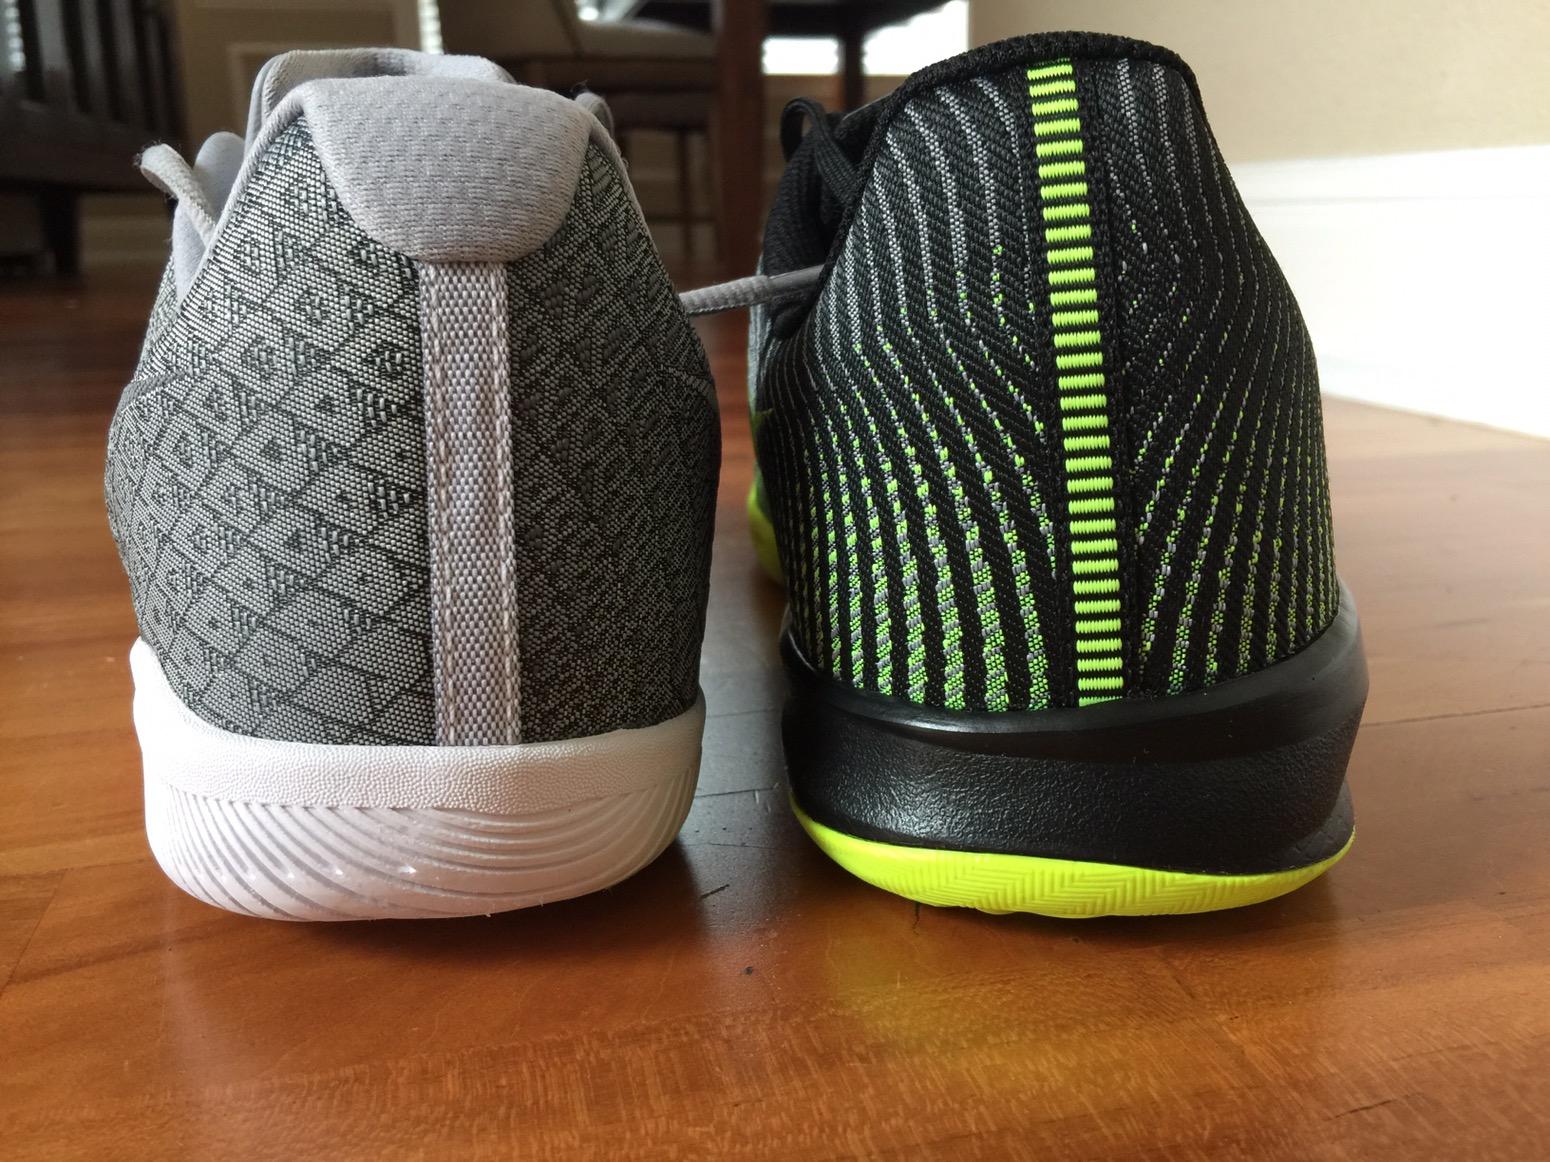 07a8a151425c Nike Kobe Mamba Instinct Performance Analysis and Review